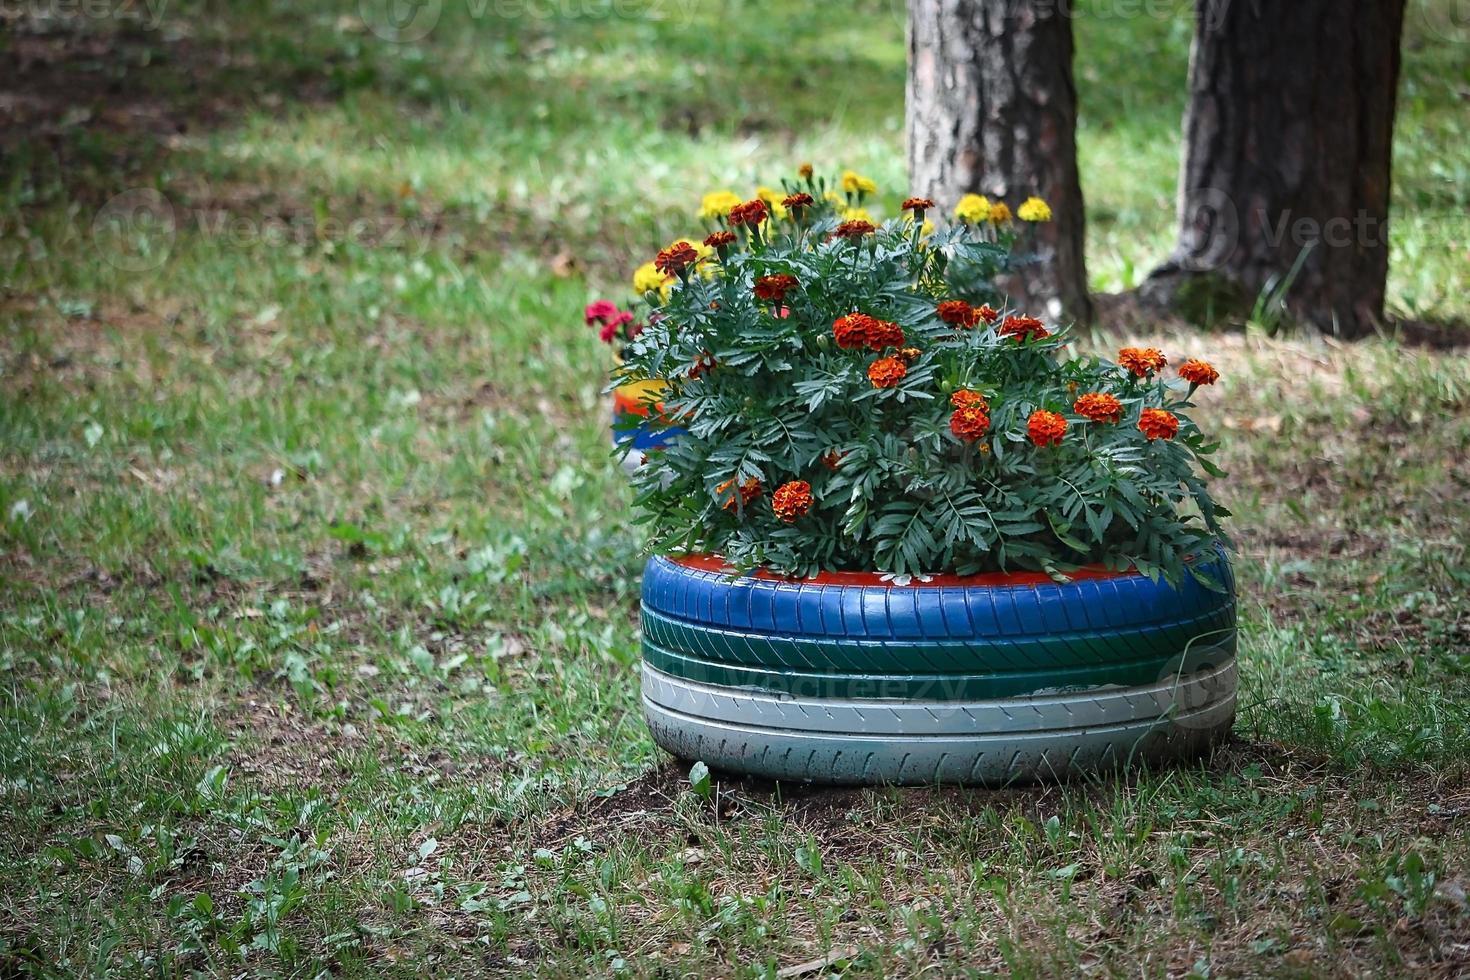 aiuola estiva fatta di pneumatici e pitture blu e bianche con fiori di calendula piantati foto